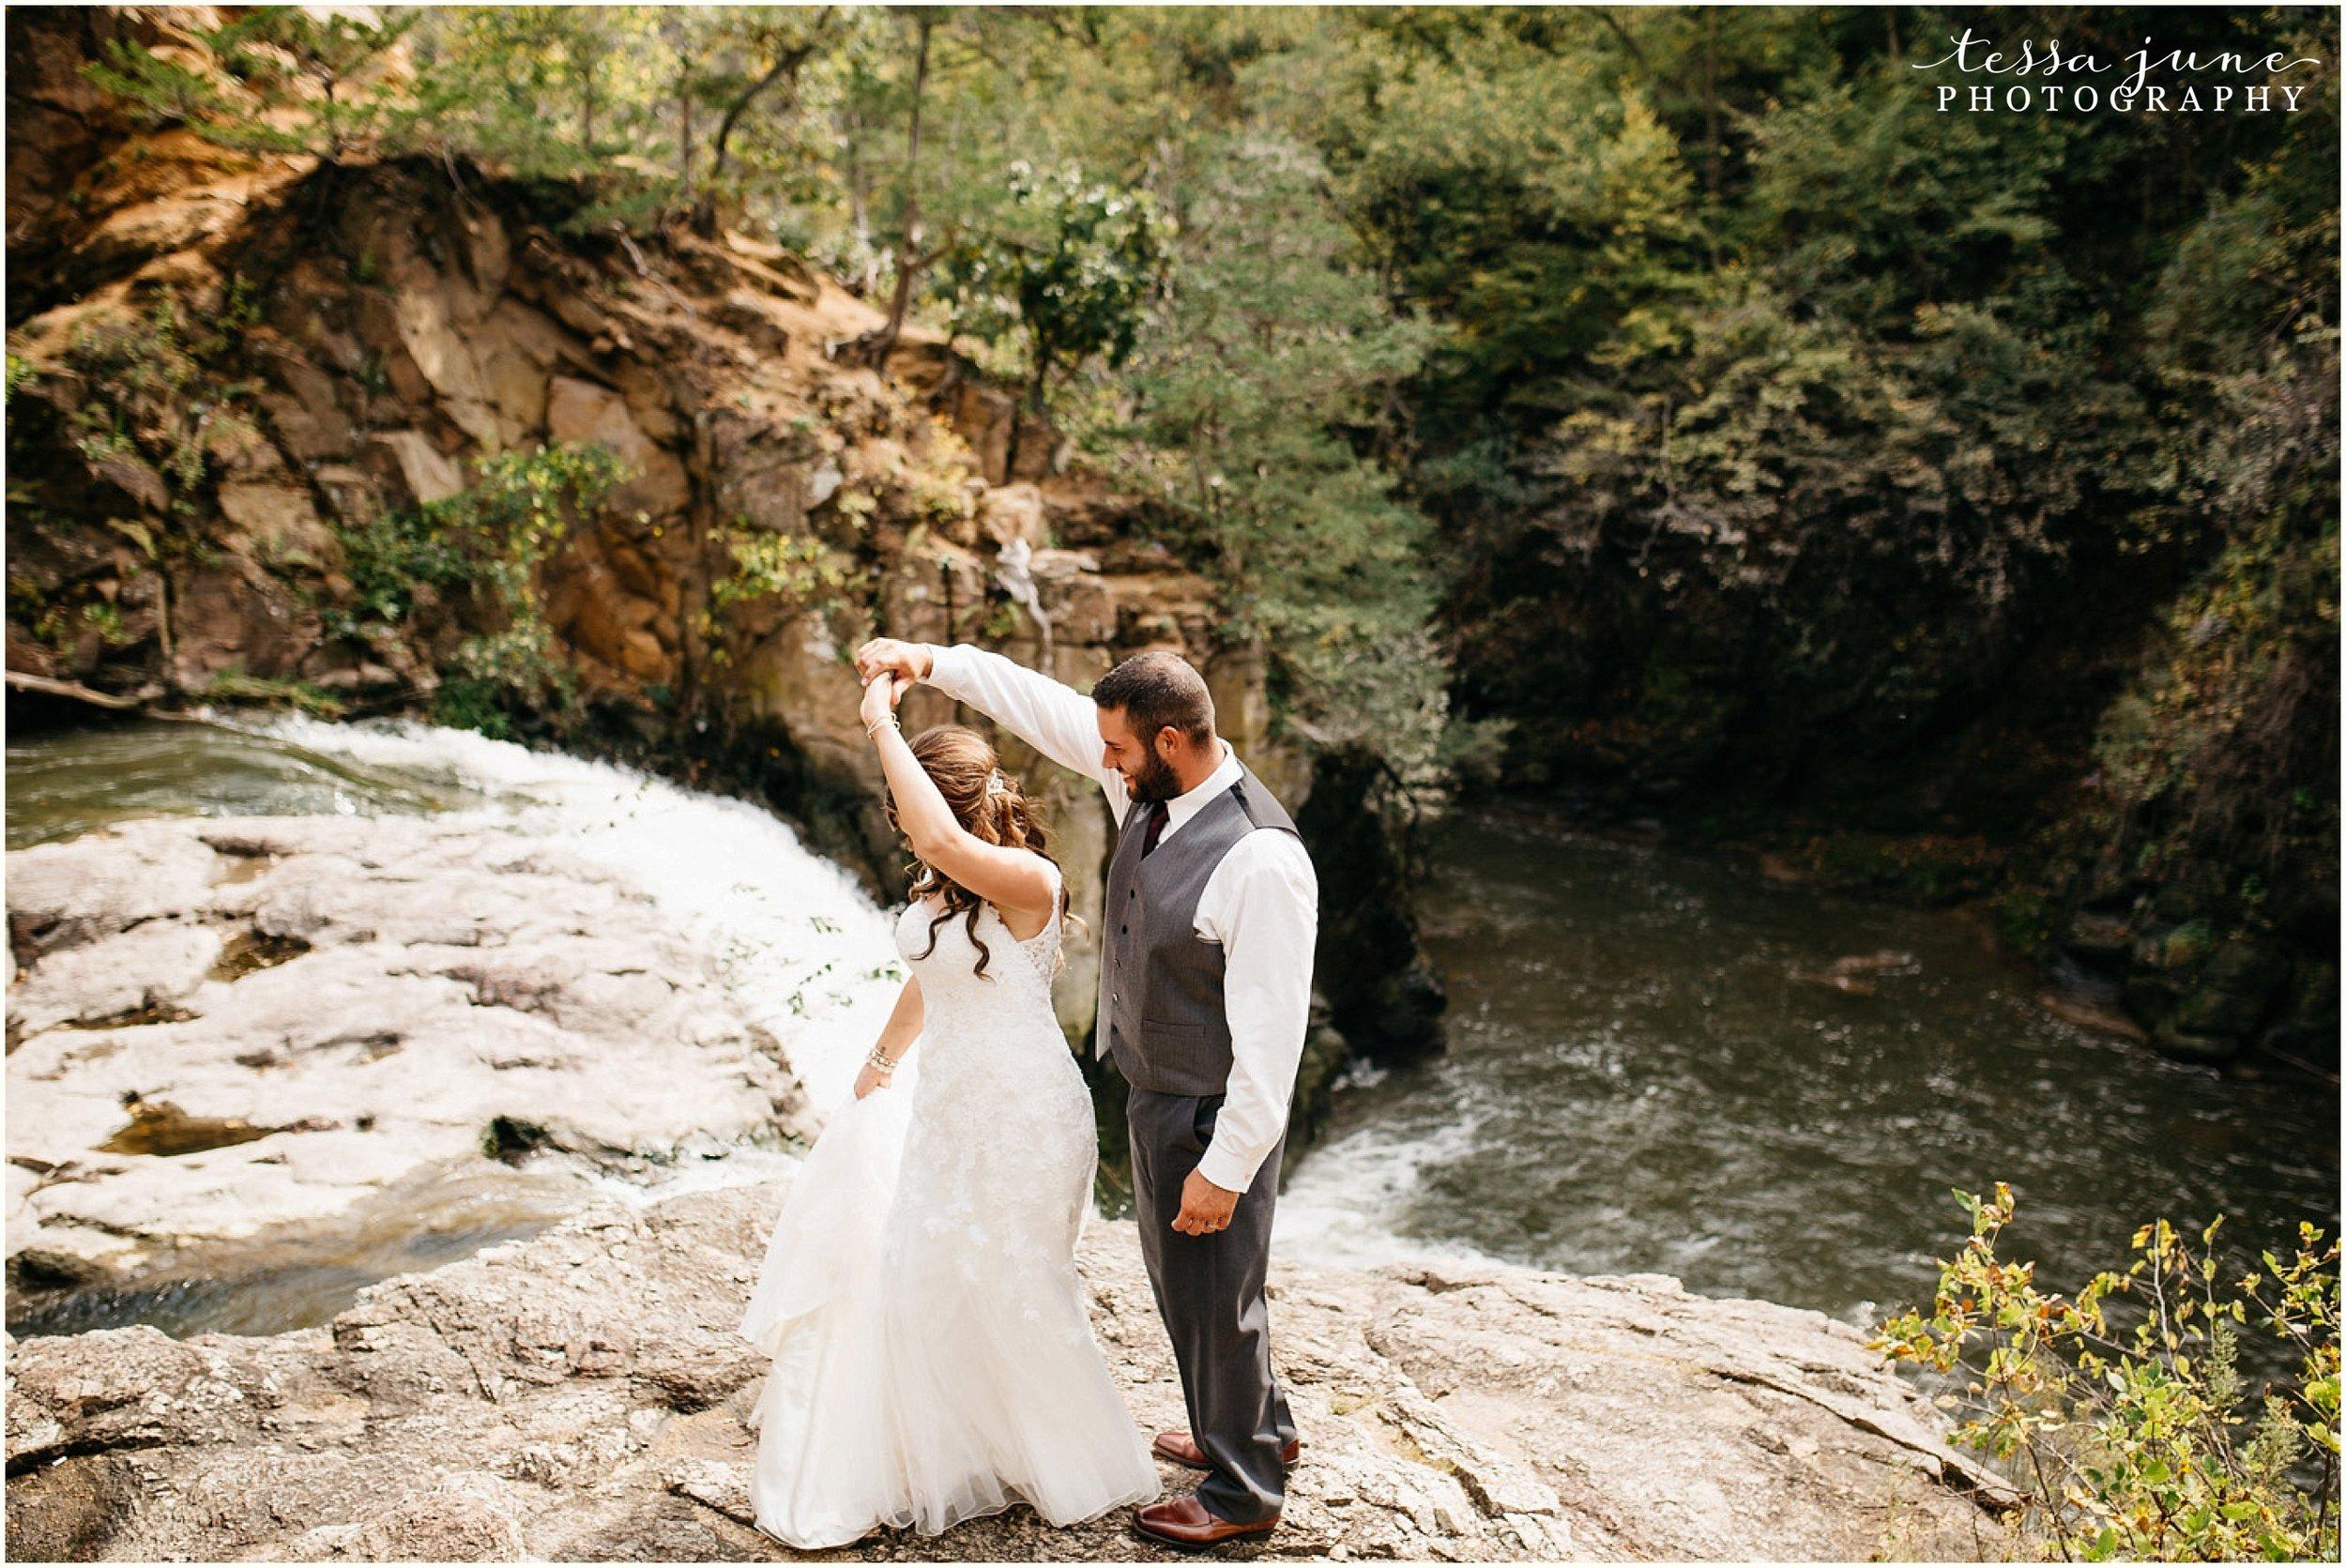 bohemian-minnesota-wedding-mismatched-bridesmaid-dresses-waterfall-st-cloud-tessa-june-photography-63.jpg